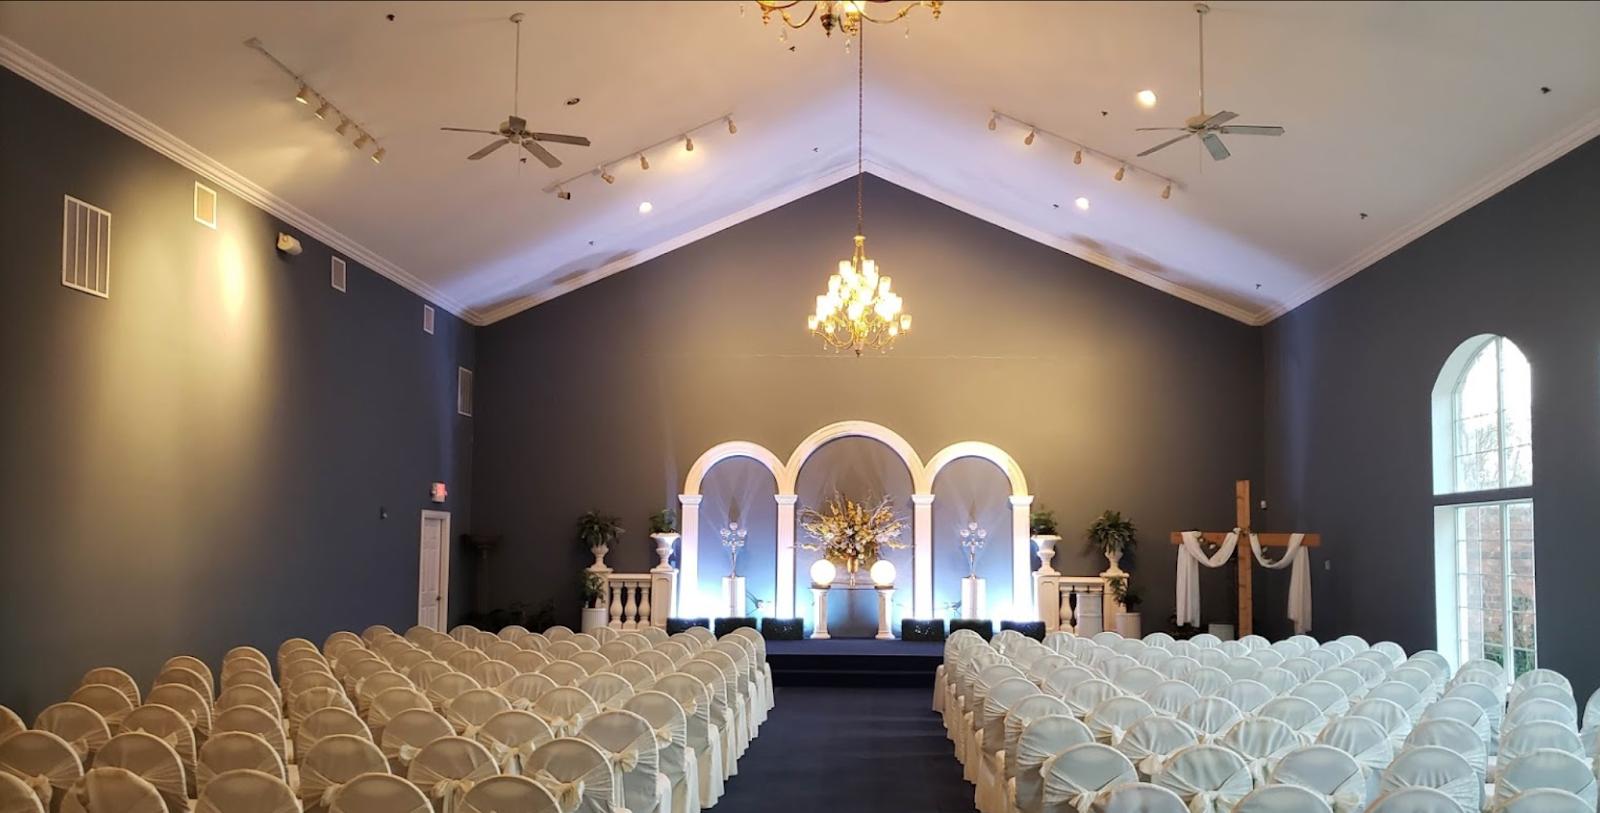 Reflections Venue and Gardens all inclusive wedding venue